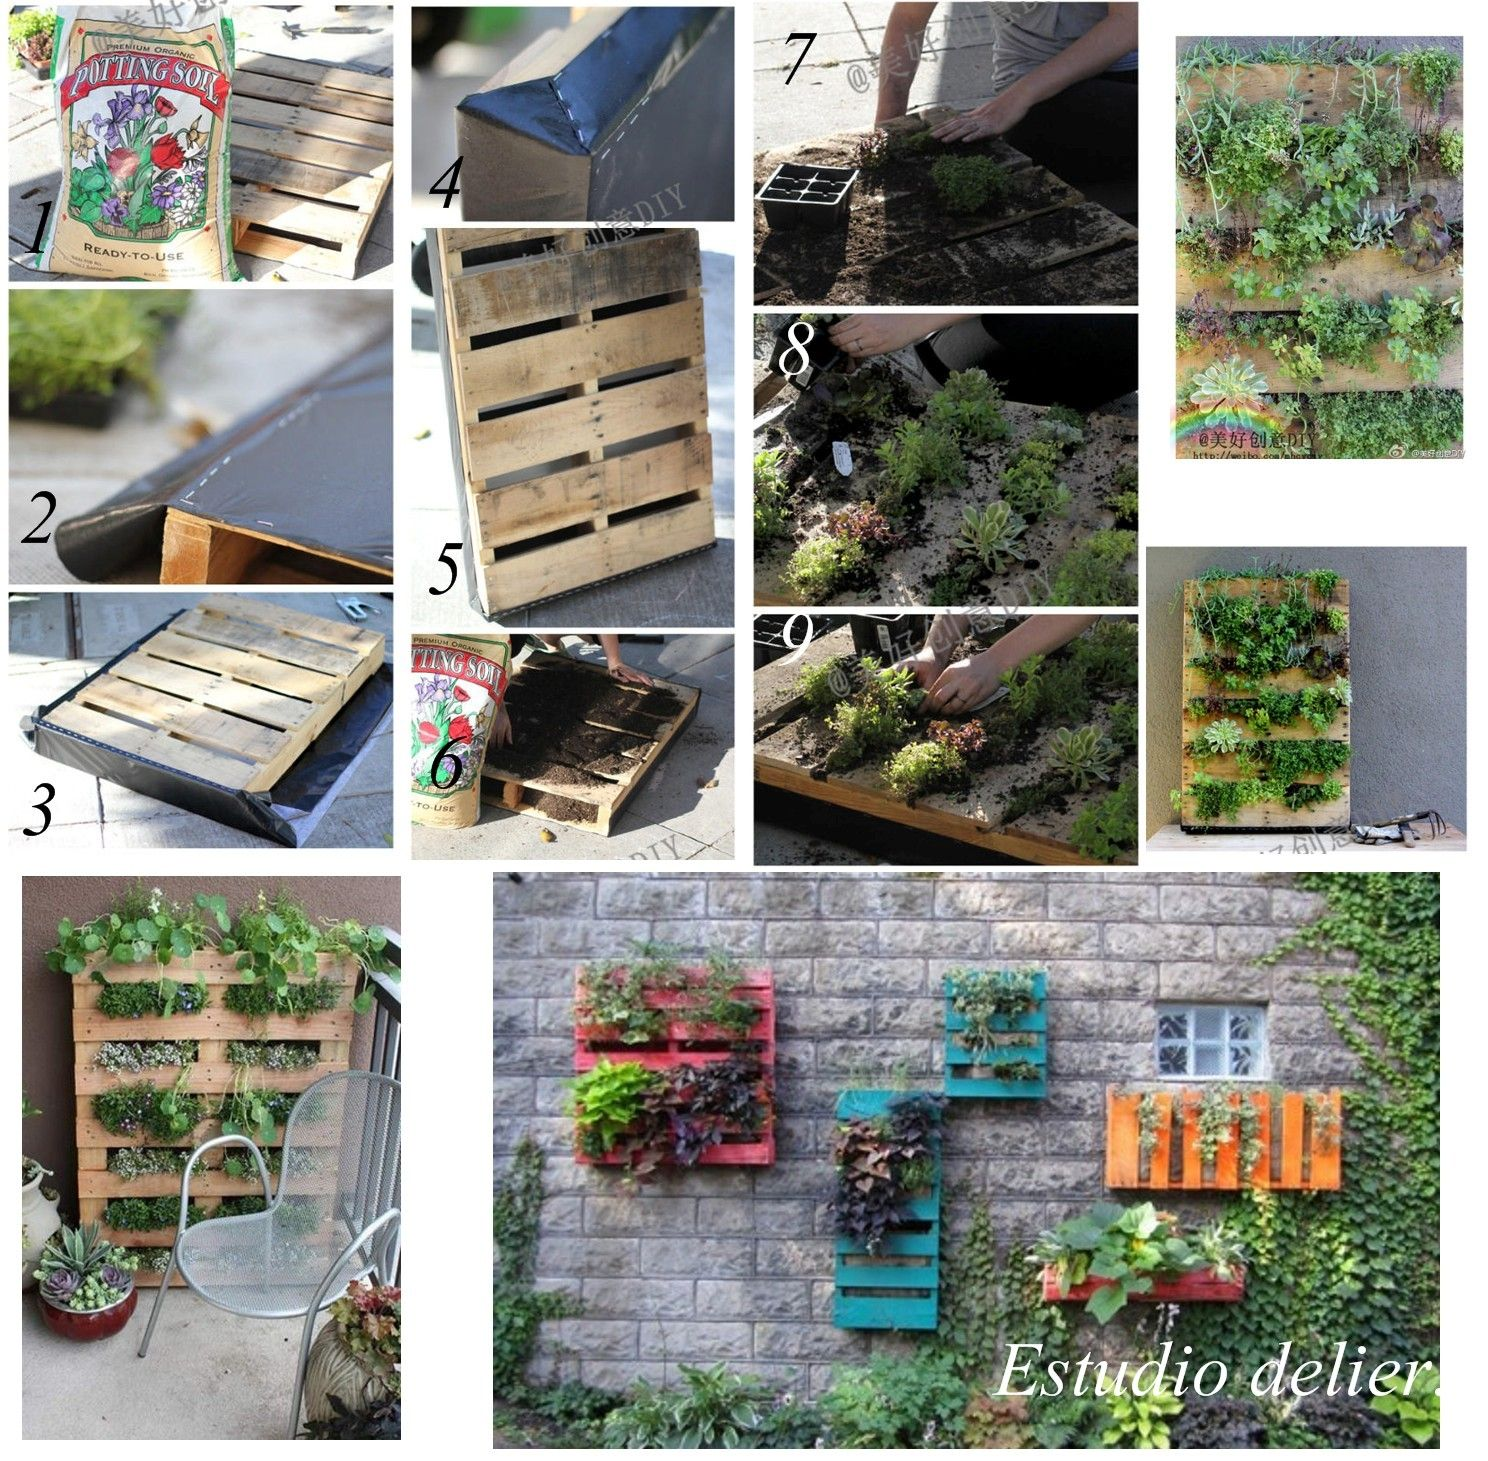 hacer un jard n vertical con palets decoracion pinterest gardens pallets and garden ideas. Black Bedroom Furniture Sets. Home Design Ideas